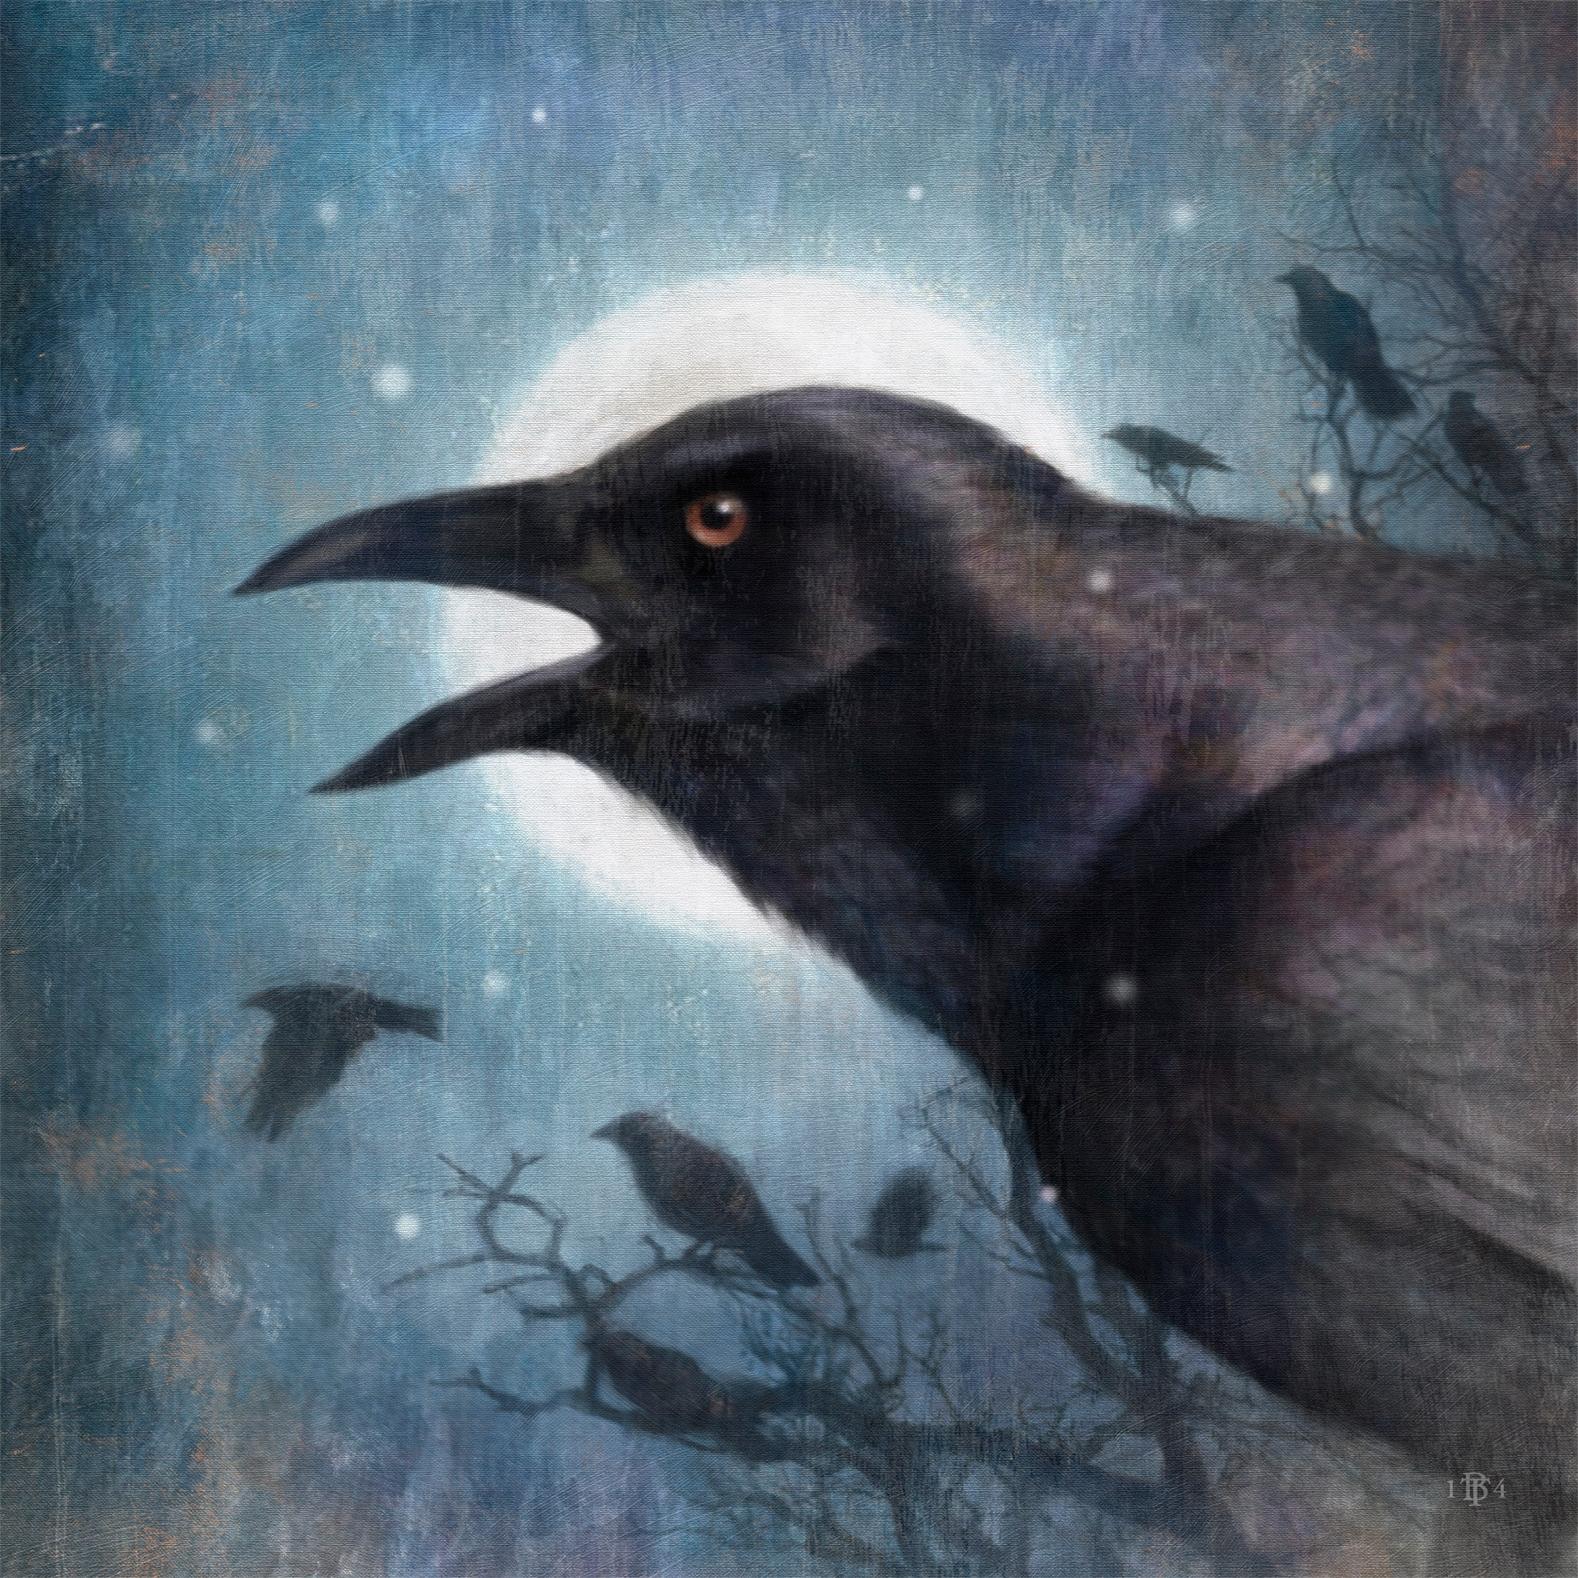 crowLrg1.jpg